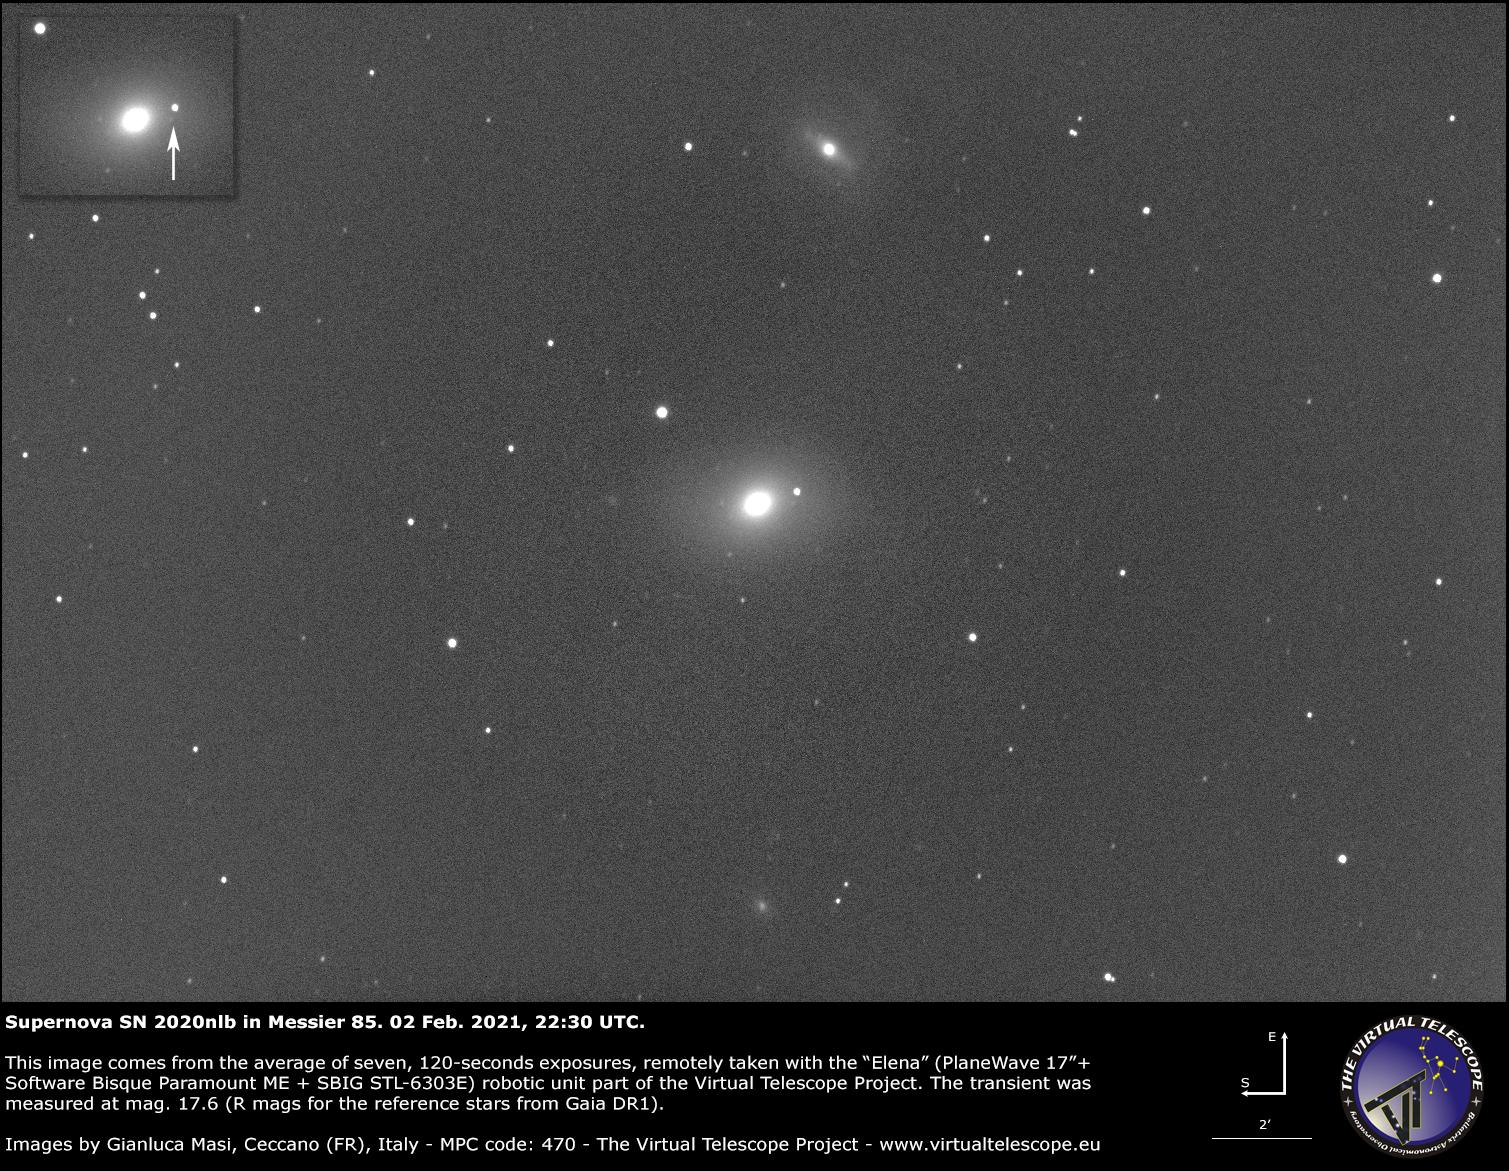 Supernova SN 2020nlb in Messier 85: an image - 02 Feb. 2021.